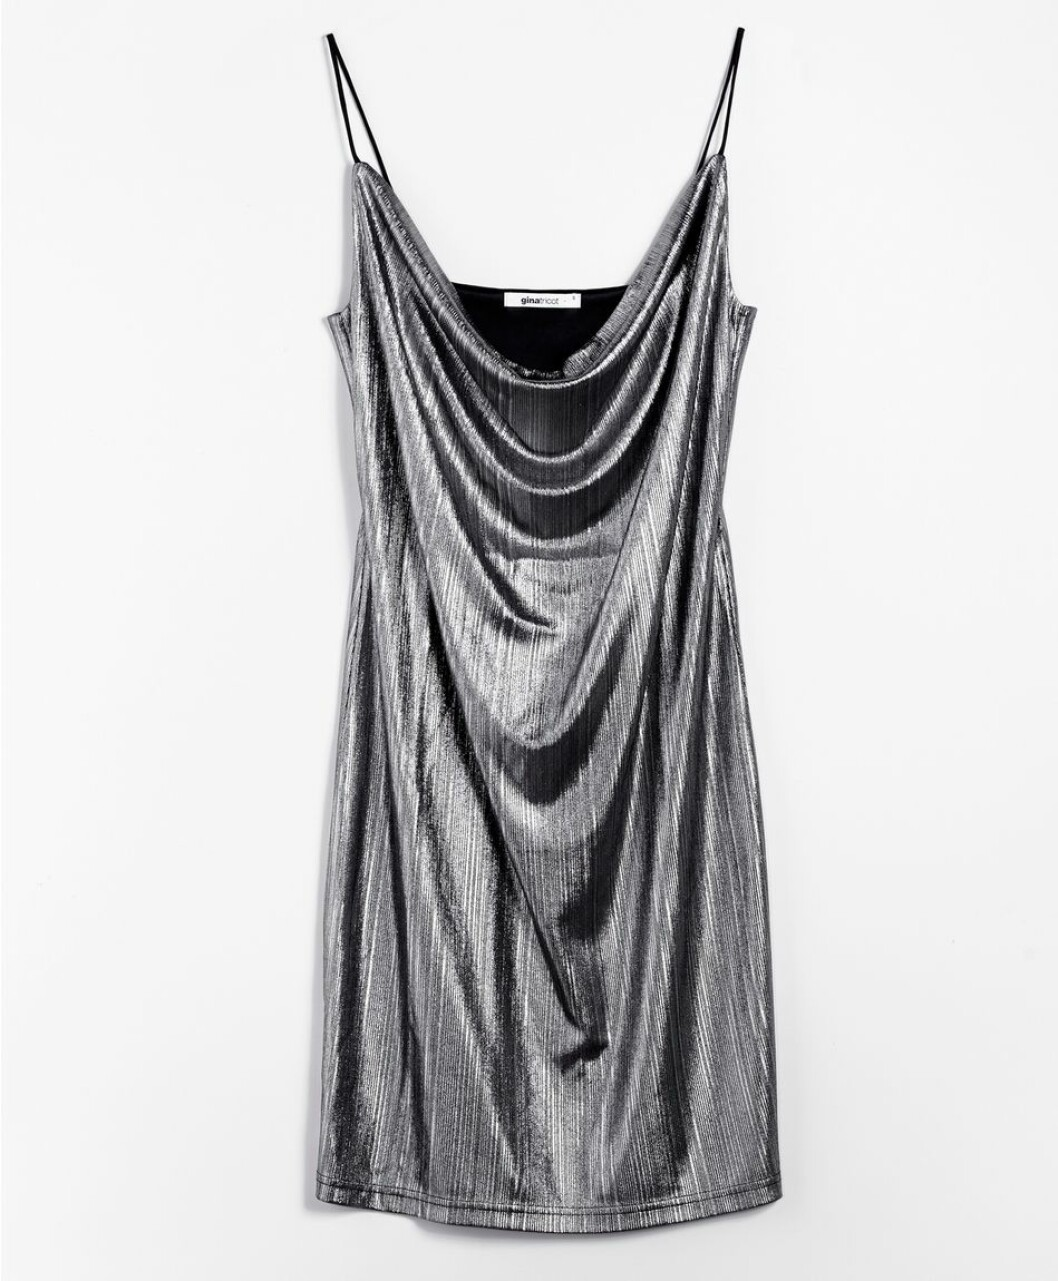 silverklänning gina tricot 2016